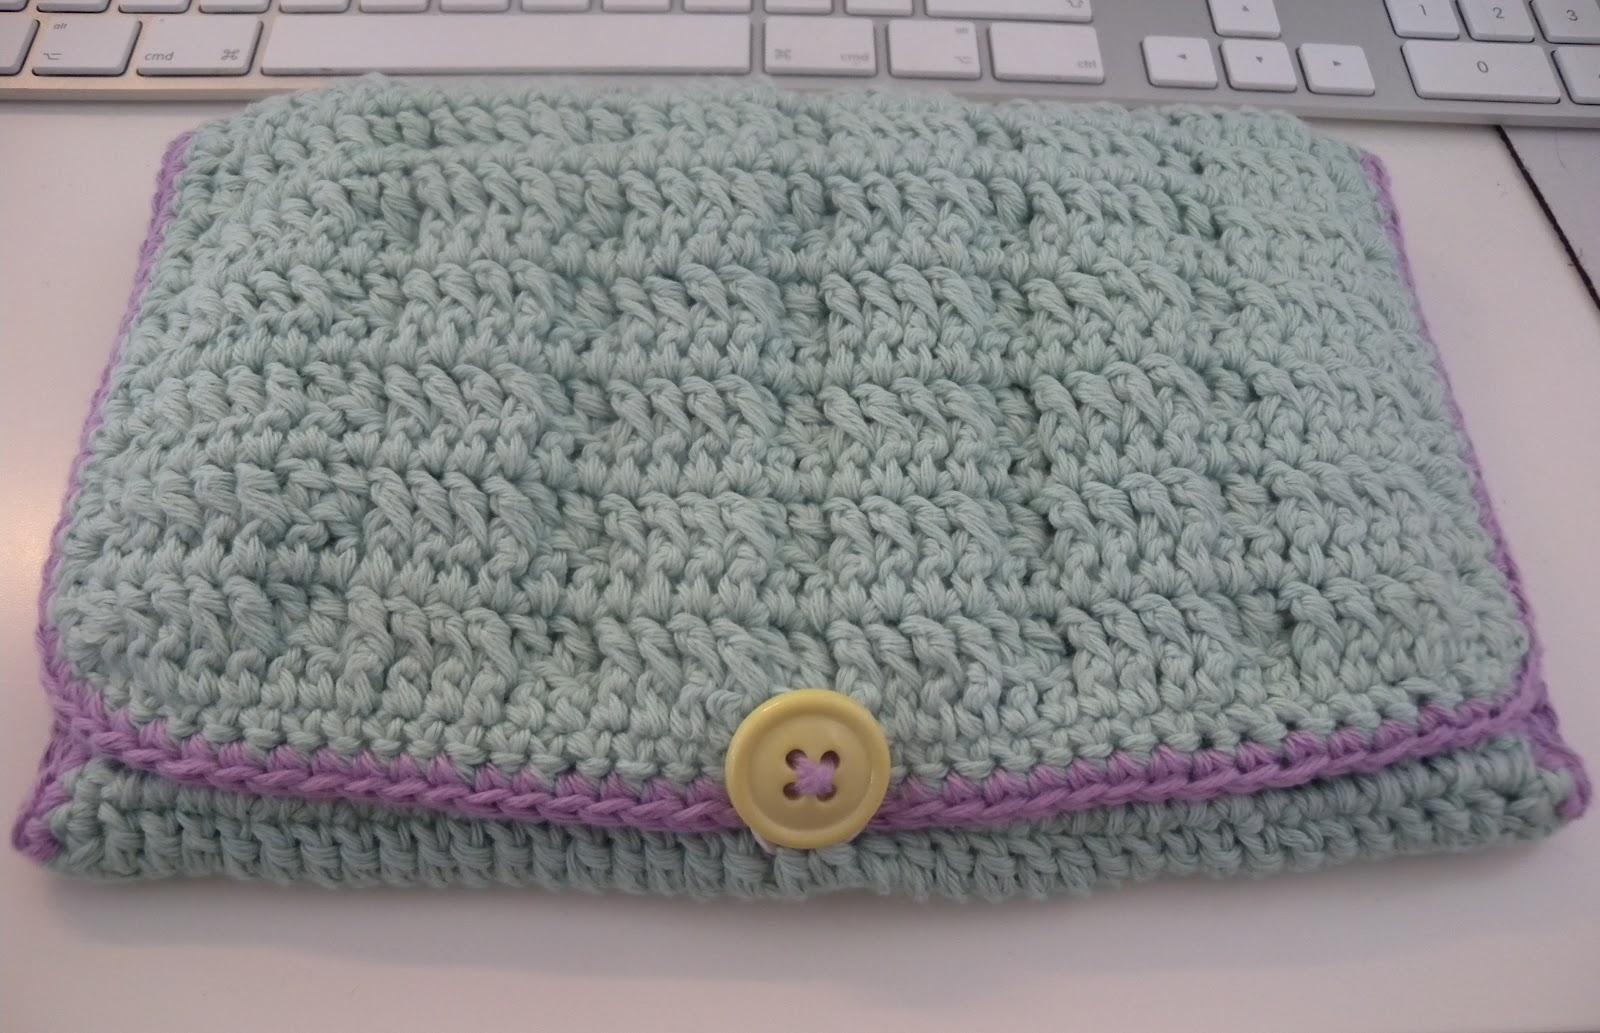 Snowflake, Cats&Coffee: Crochet hook case